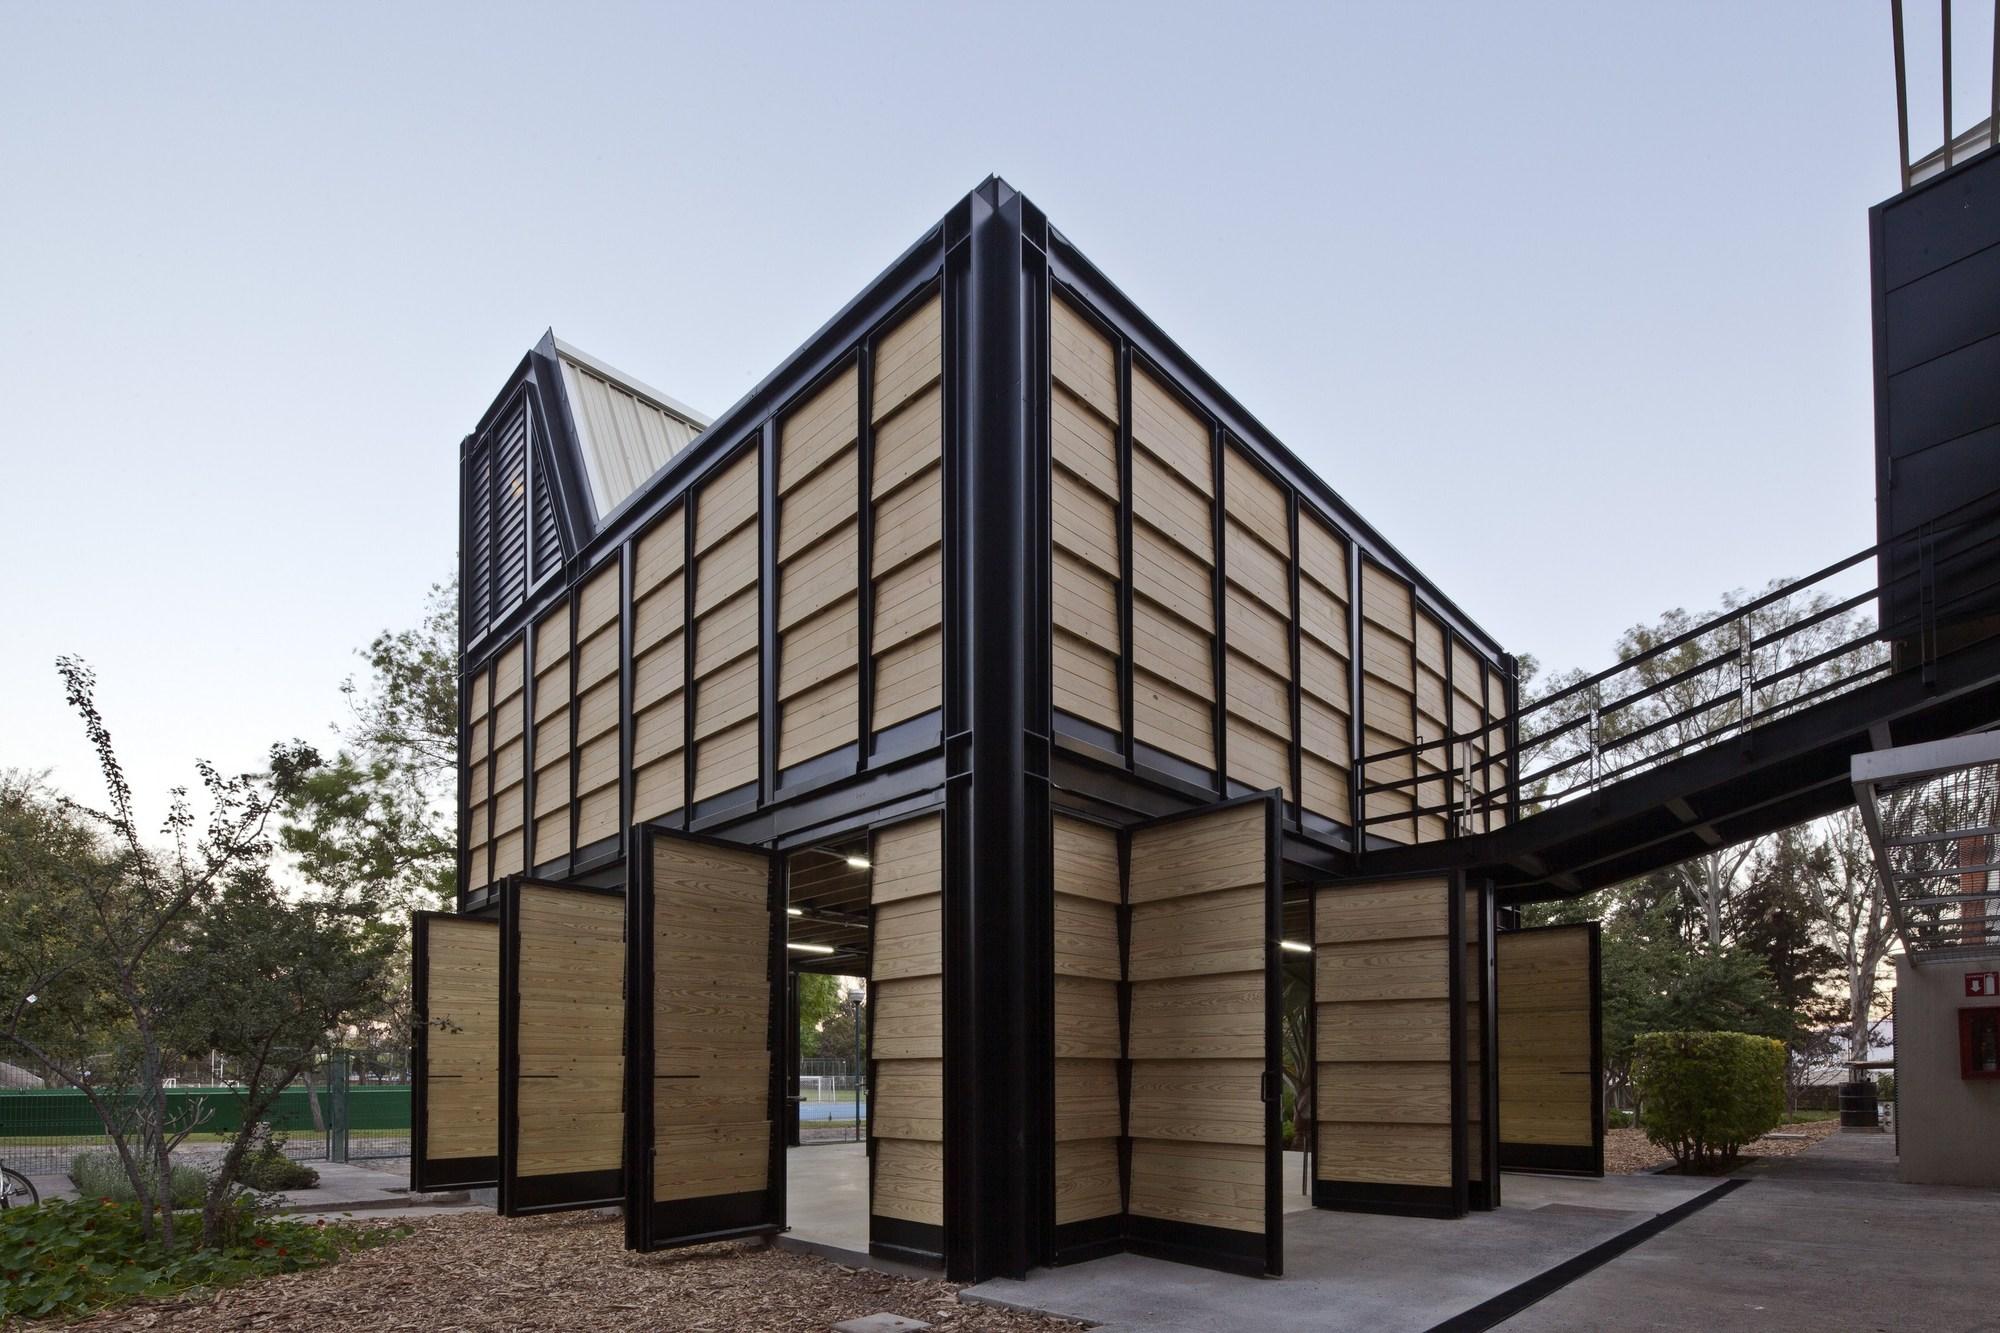 Anexo tid iteso atelier ars plataforma arquitectura for Plataforma arquitectura